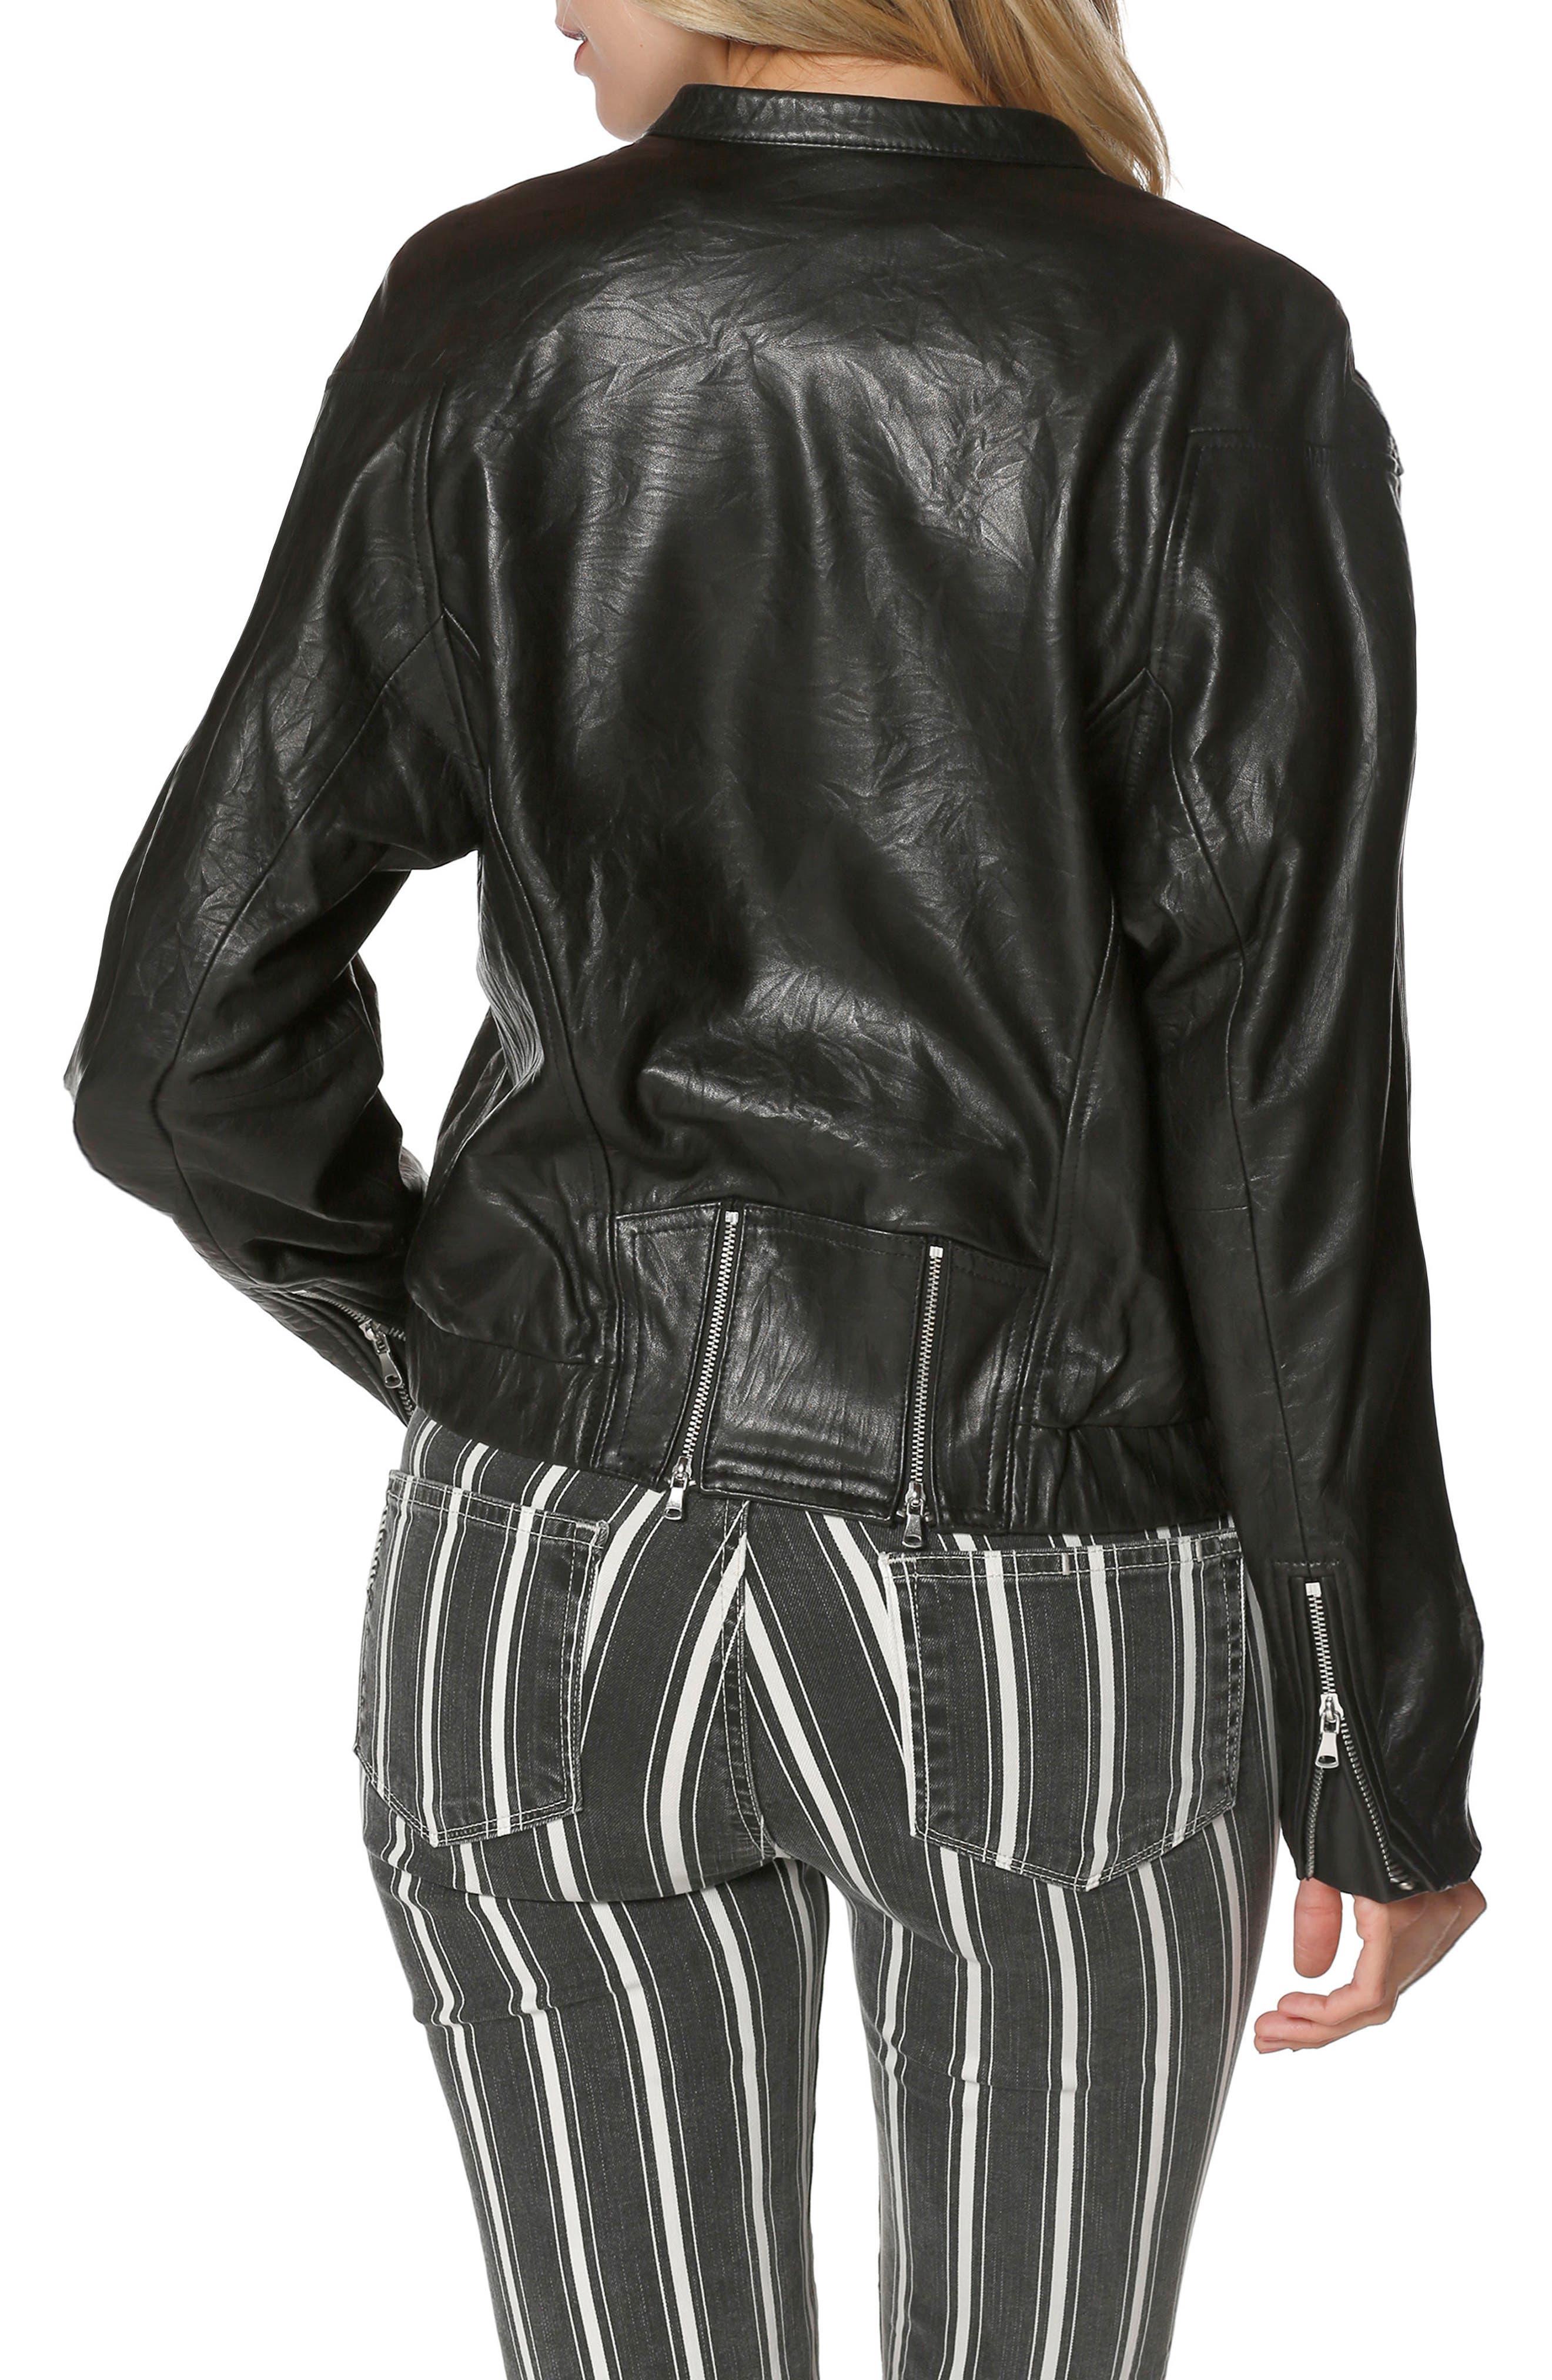 Giana Leather Moto Jacket,                             Alternate thumbnail 2, color,